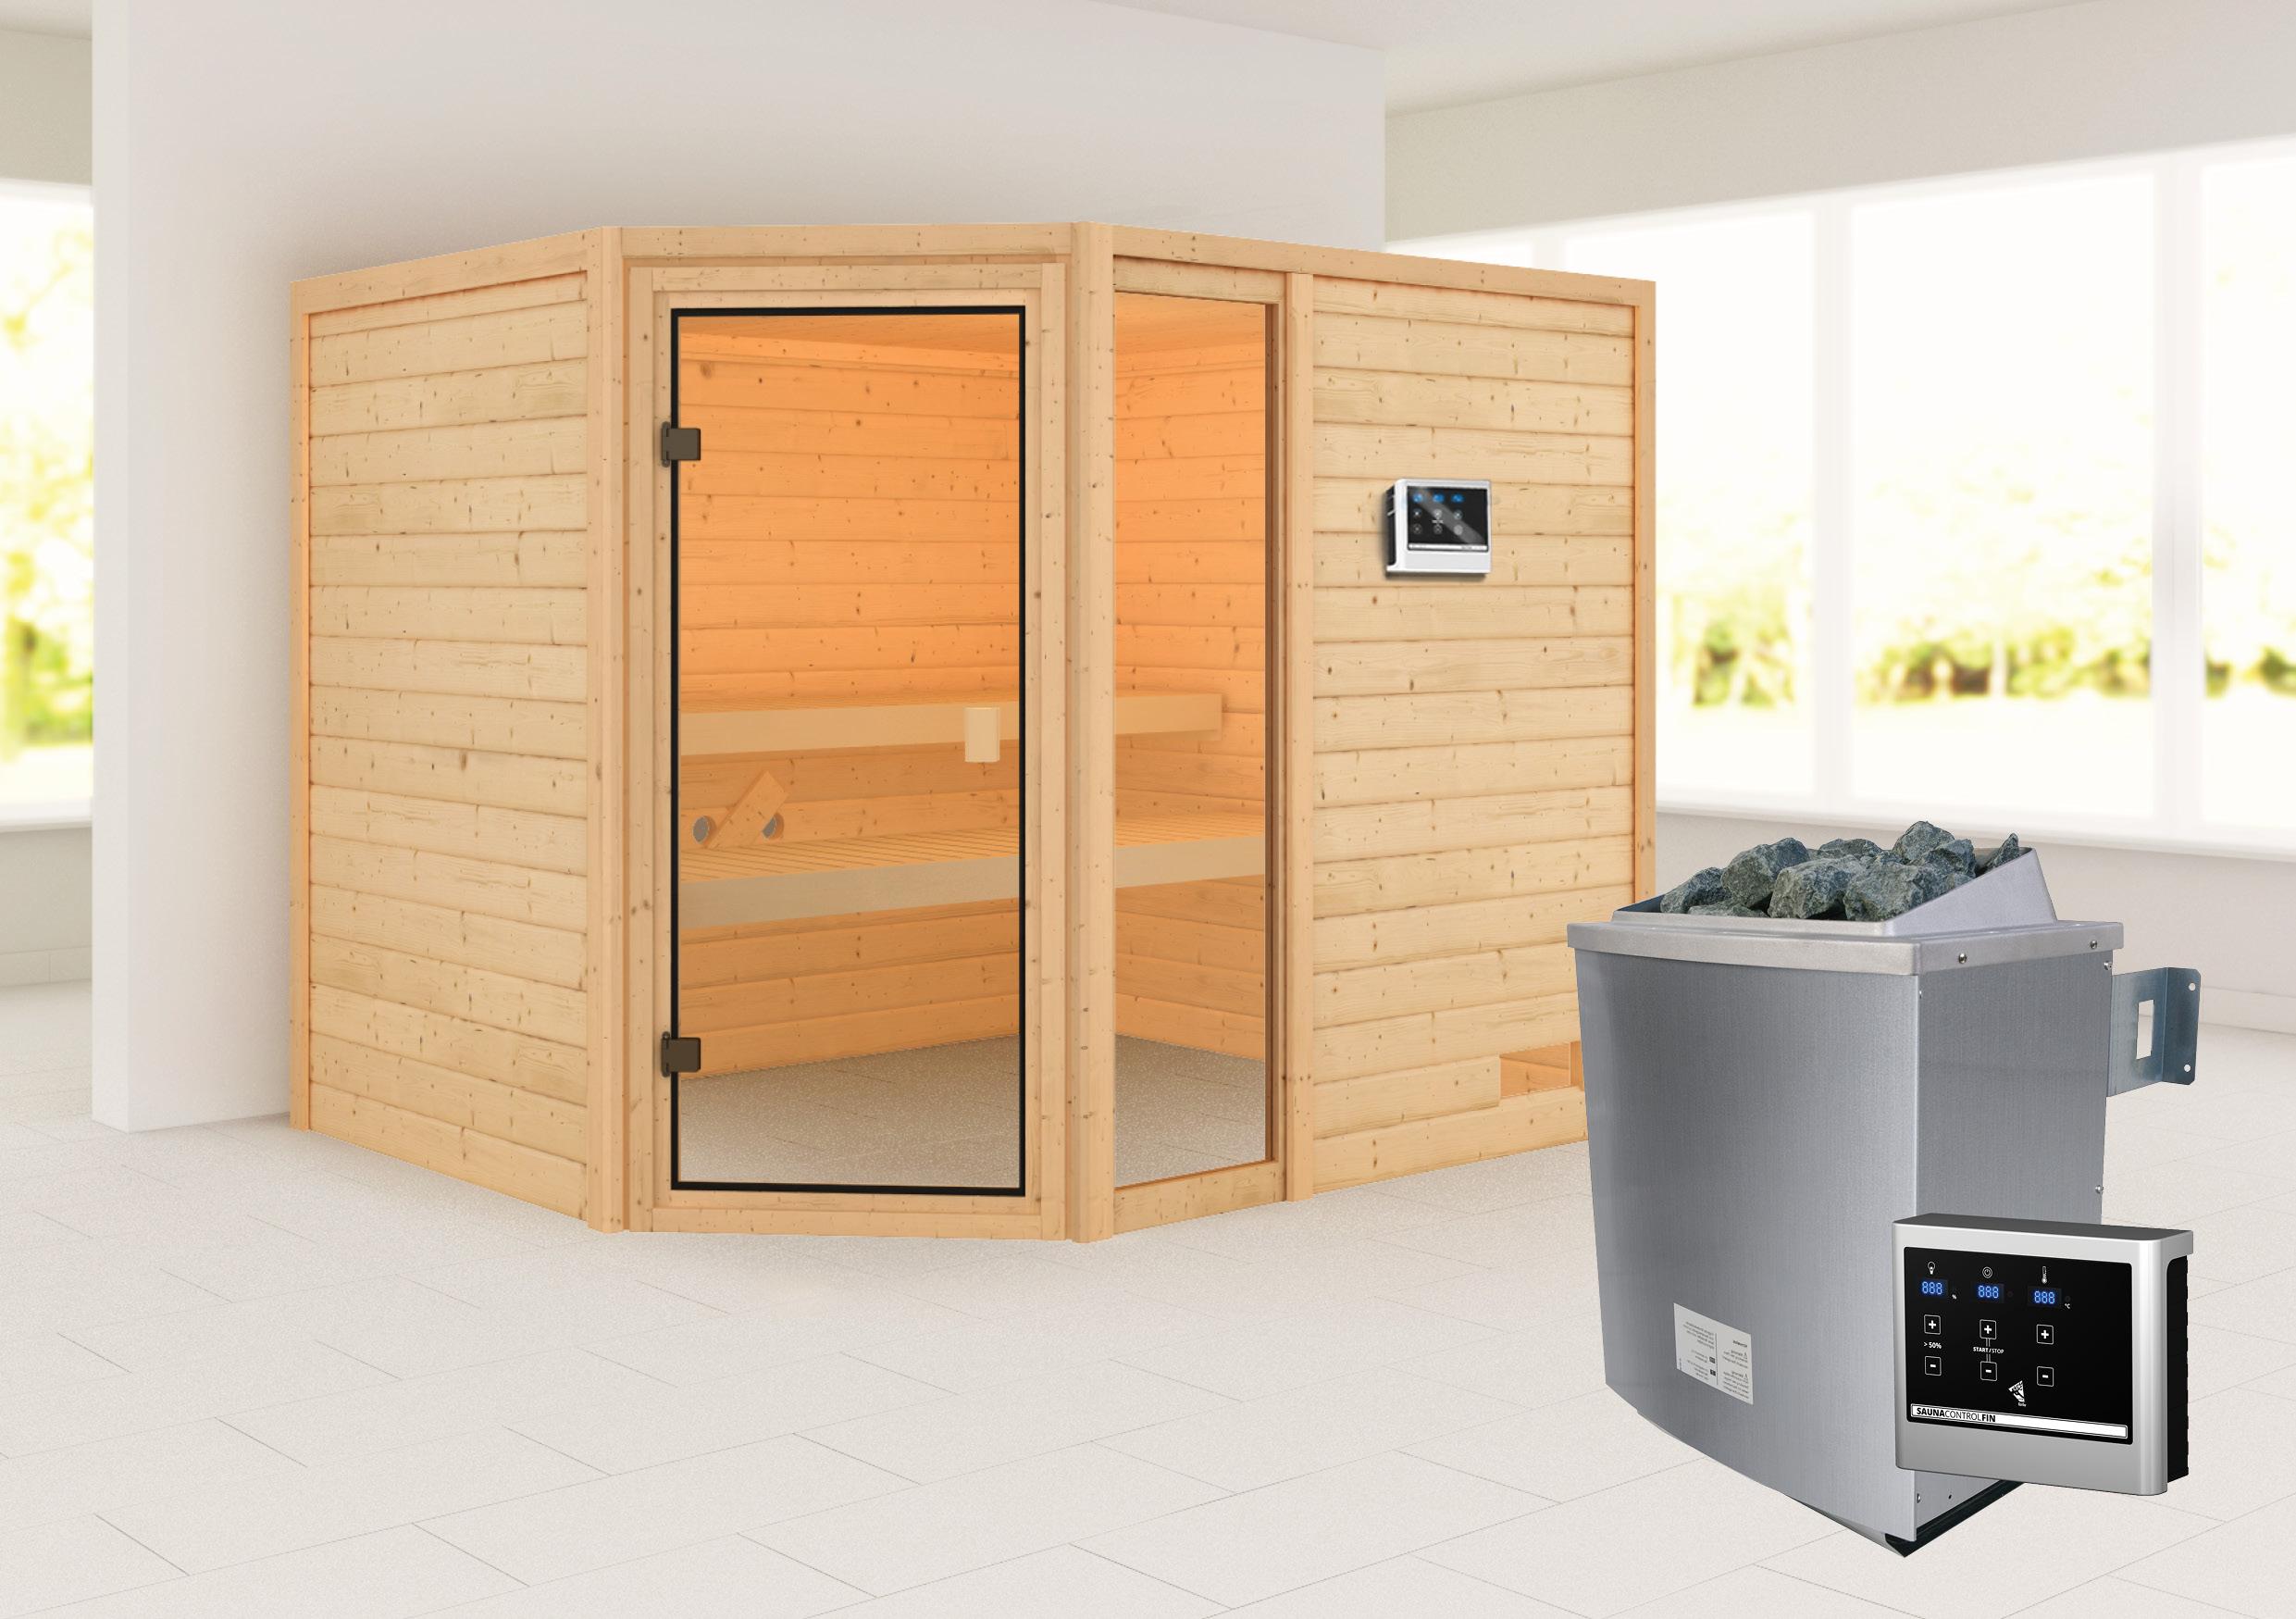 Woodfeeling Sauna Lola 38mm Saunaofen 9 kW extern Bild 1